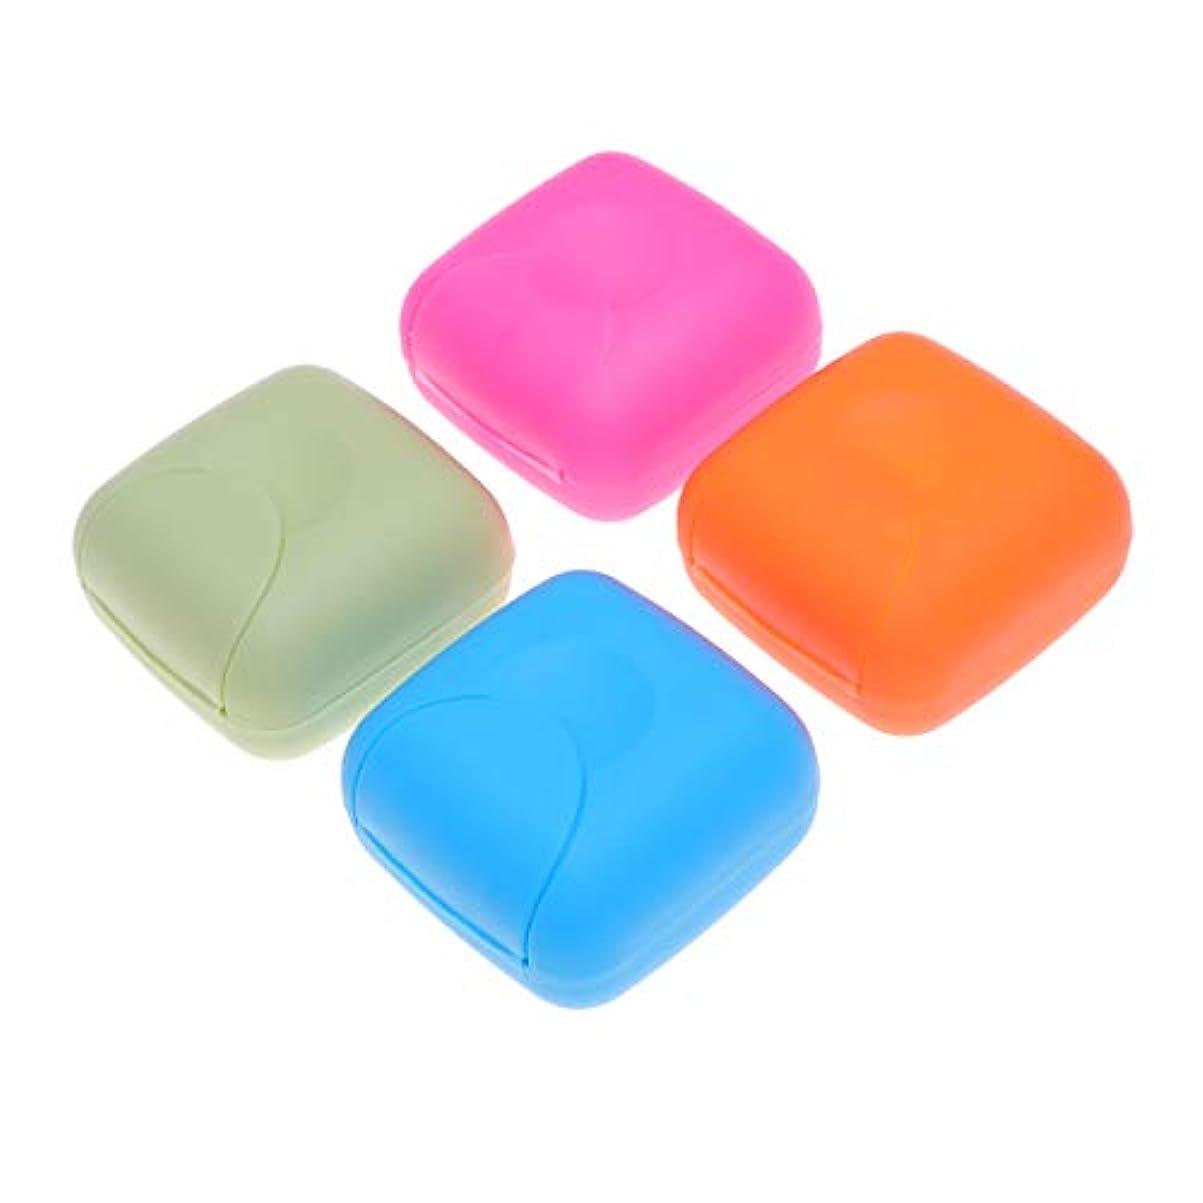 Healifty ソープボックス旅行密封されたポータブルホルダー家庭用ソープディッシュバスルームソープセーバーケースコンテナ用キャンプジム小型サイズ4ピース